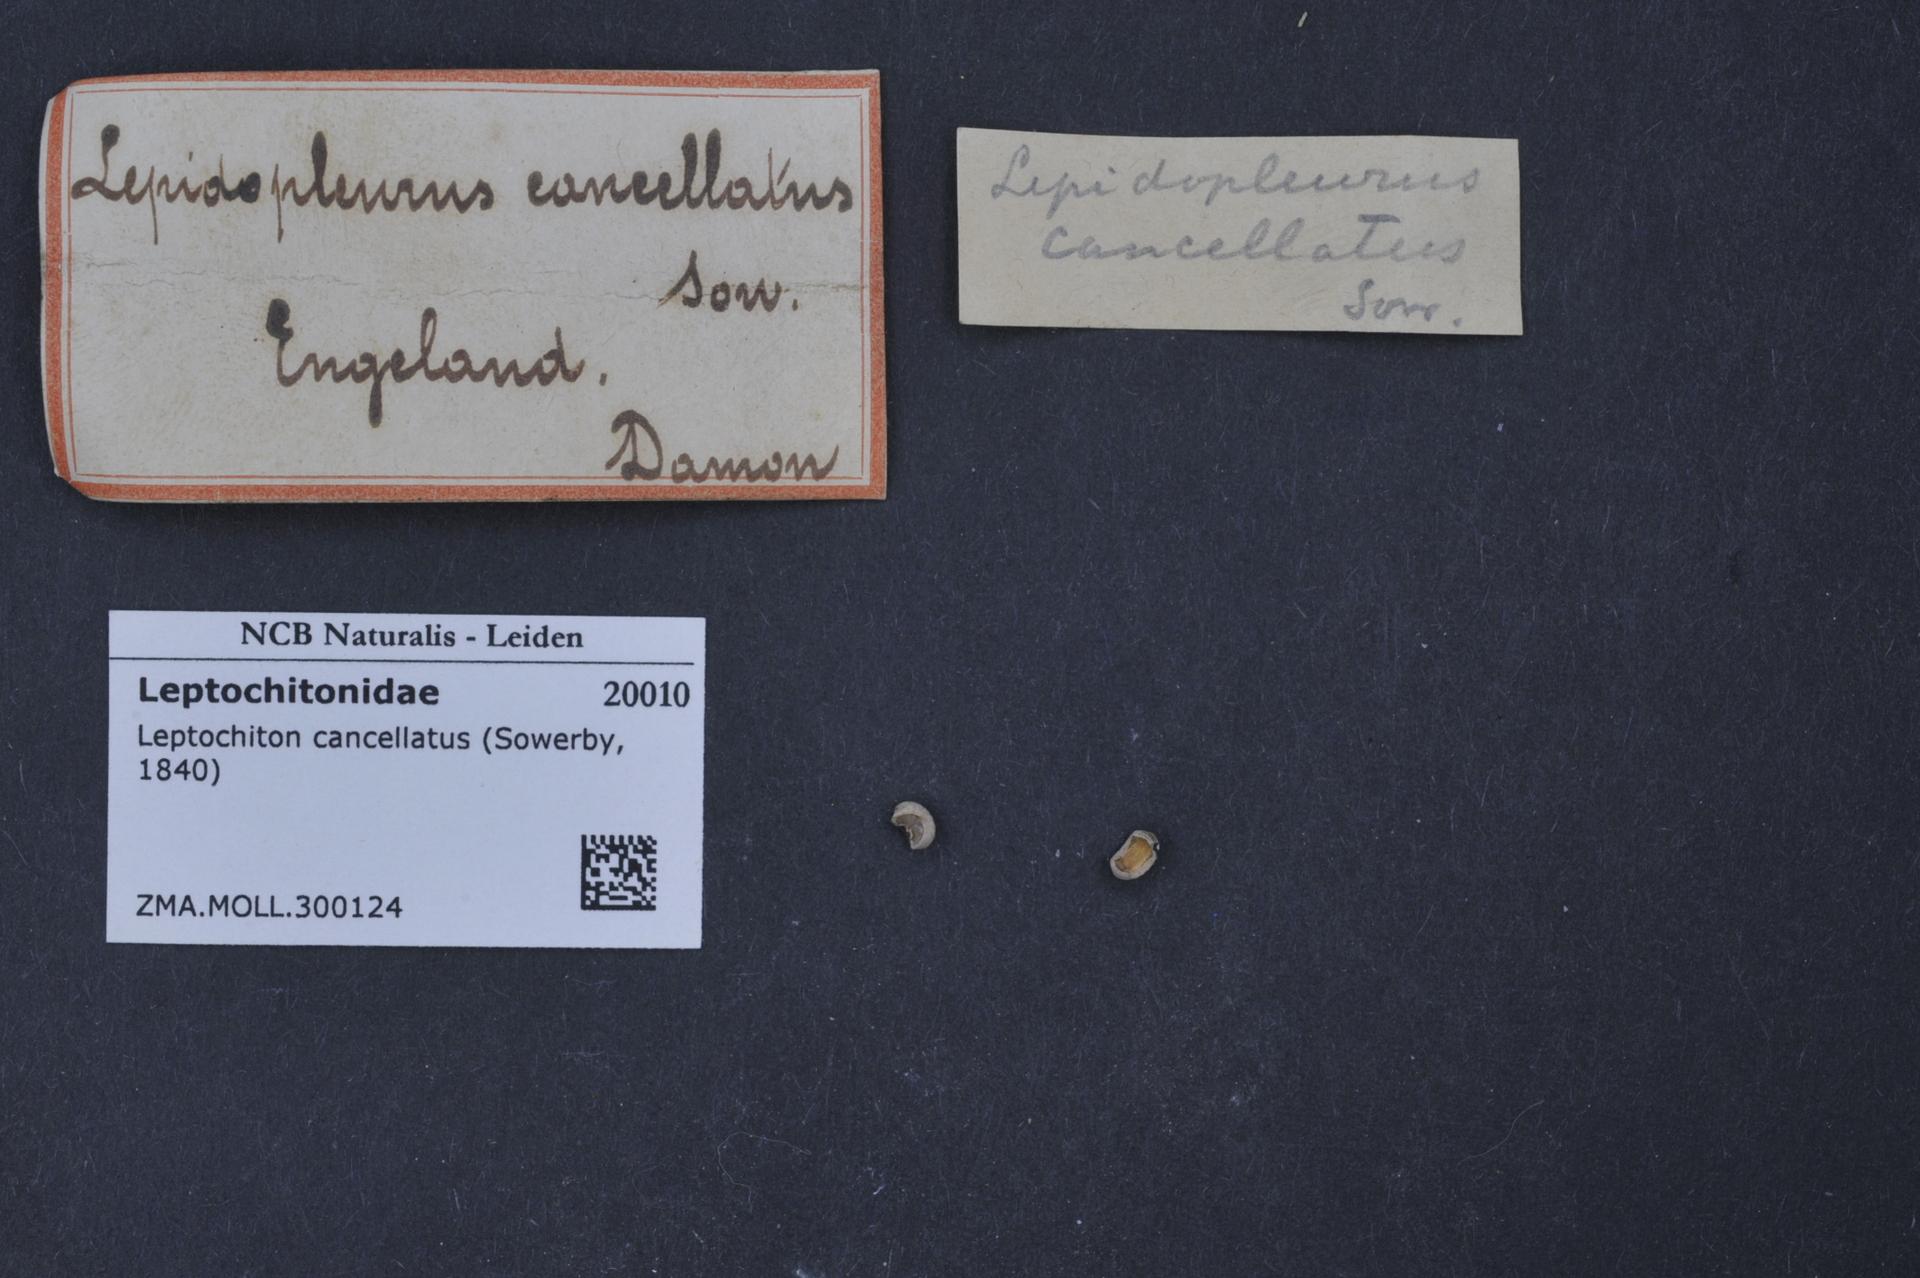 ZMA.MOLL.300124 | Leptochiton cancellatus Sowerby, 1840